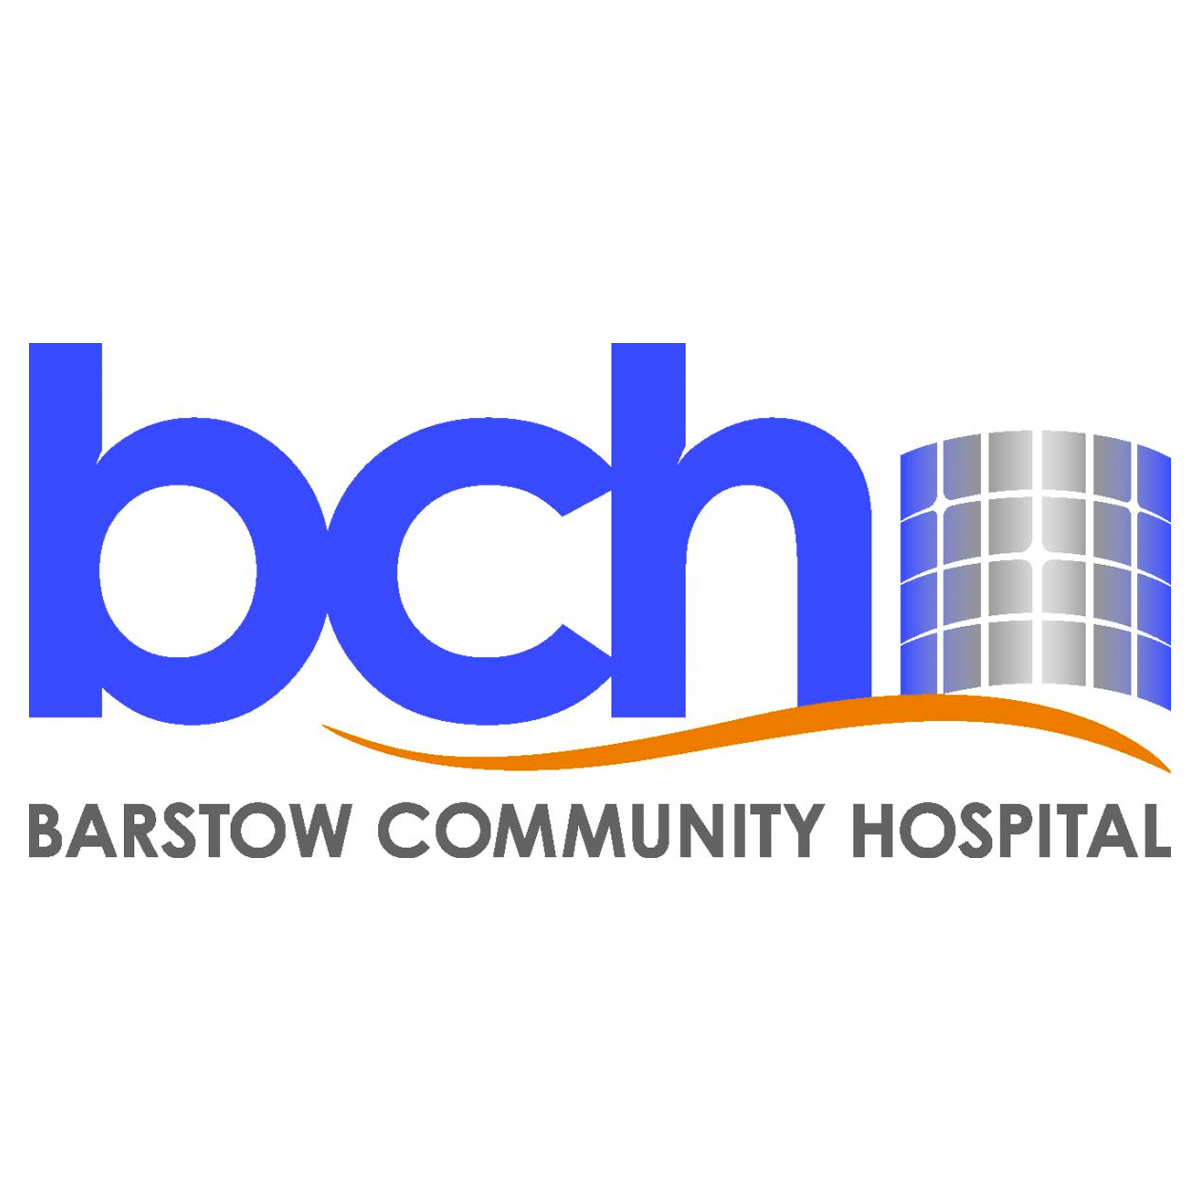 Barstow Community Hospital